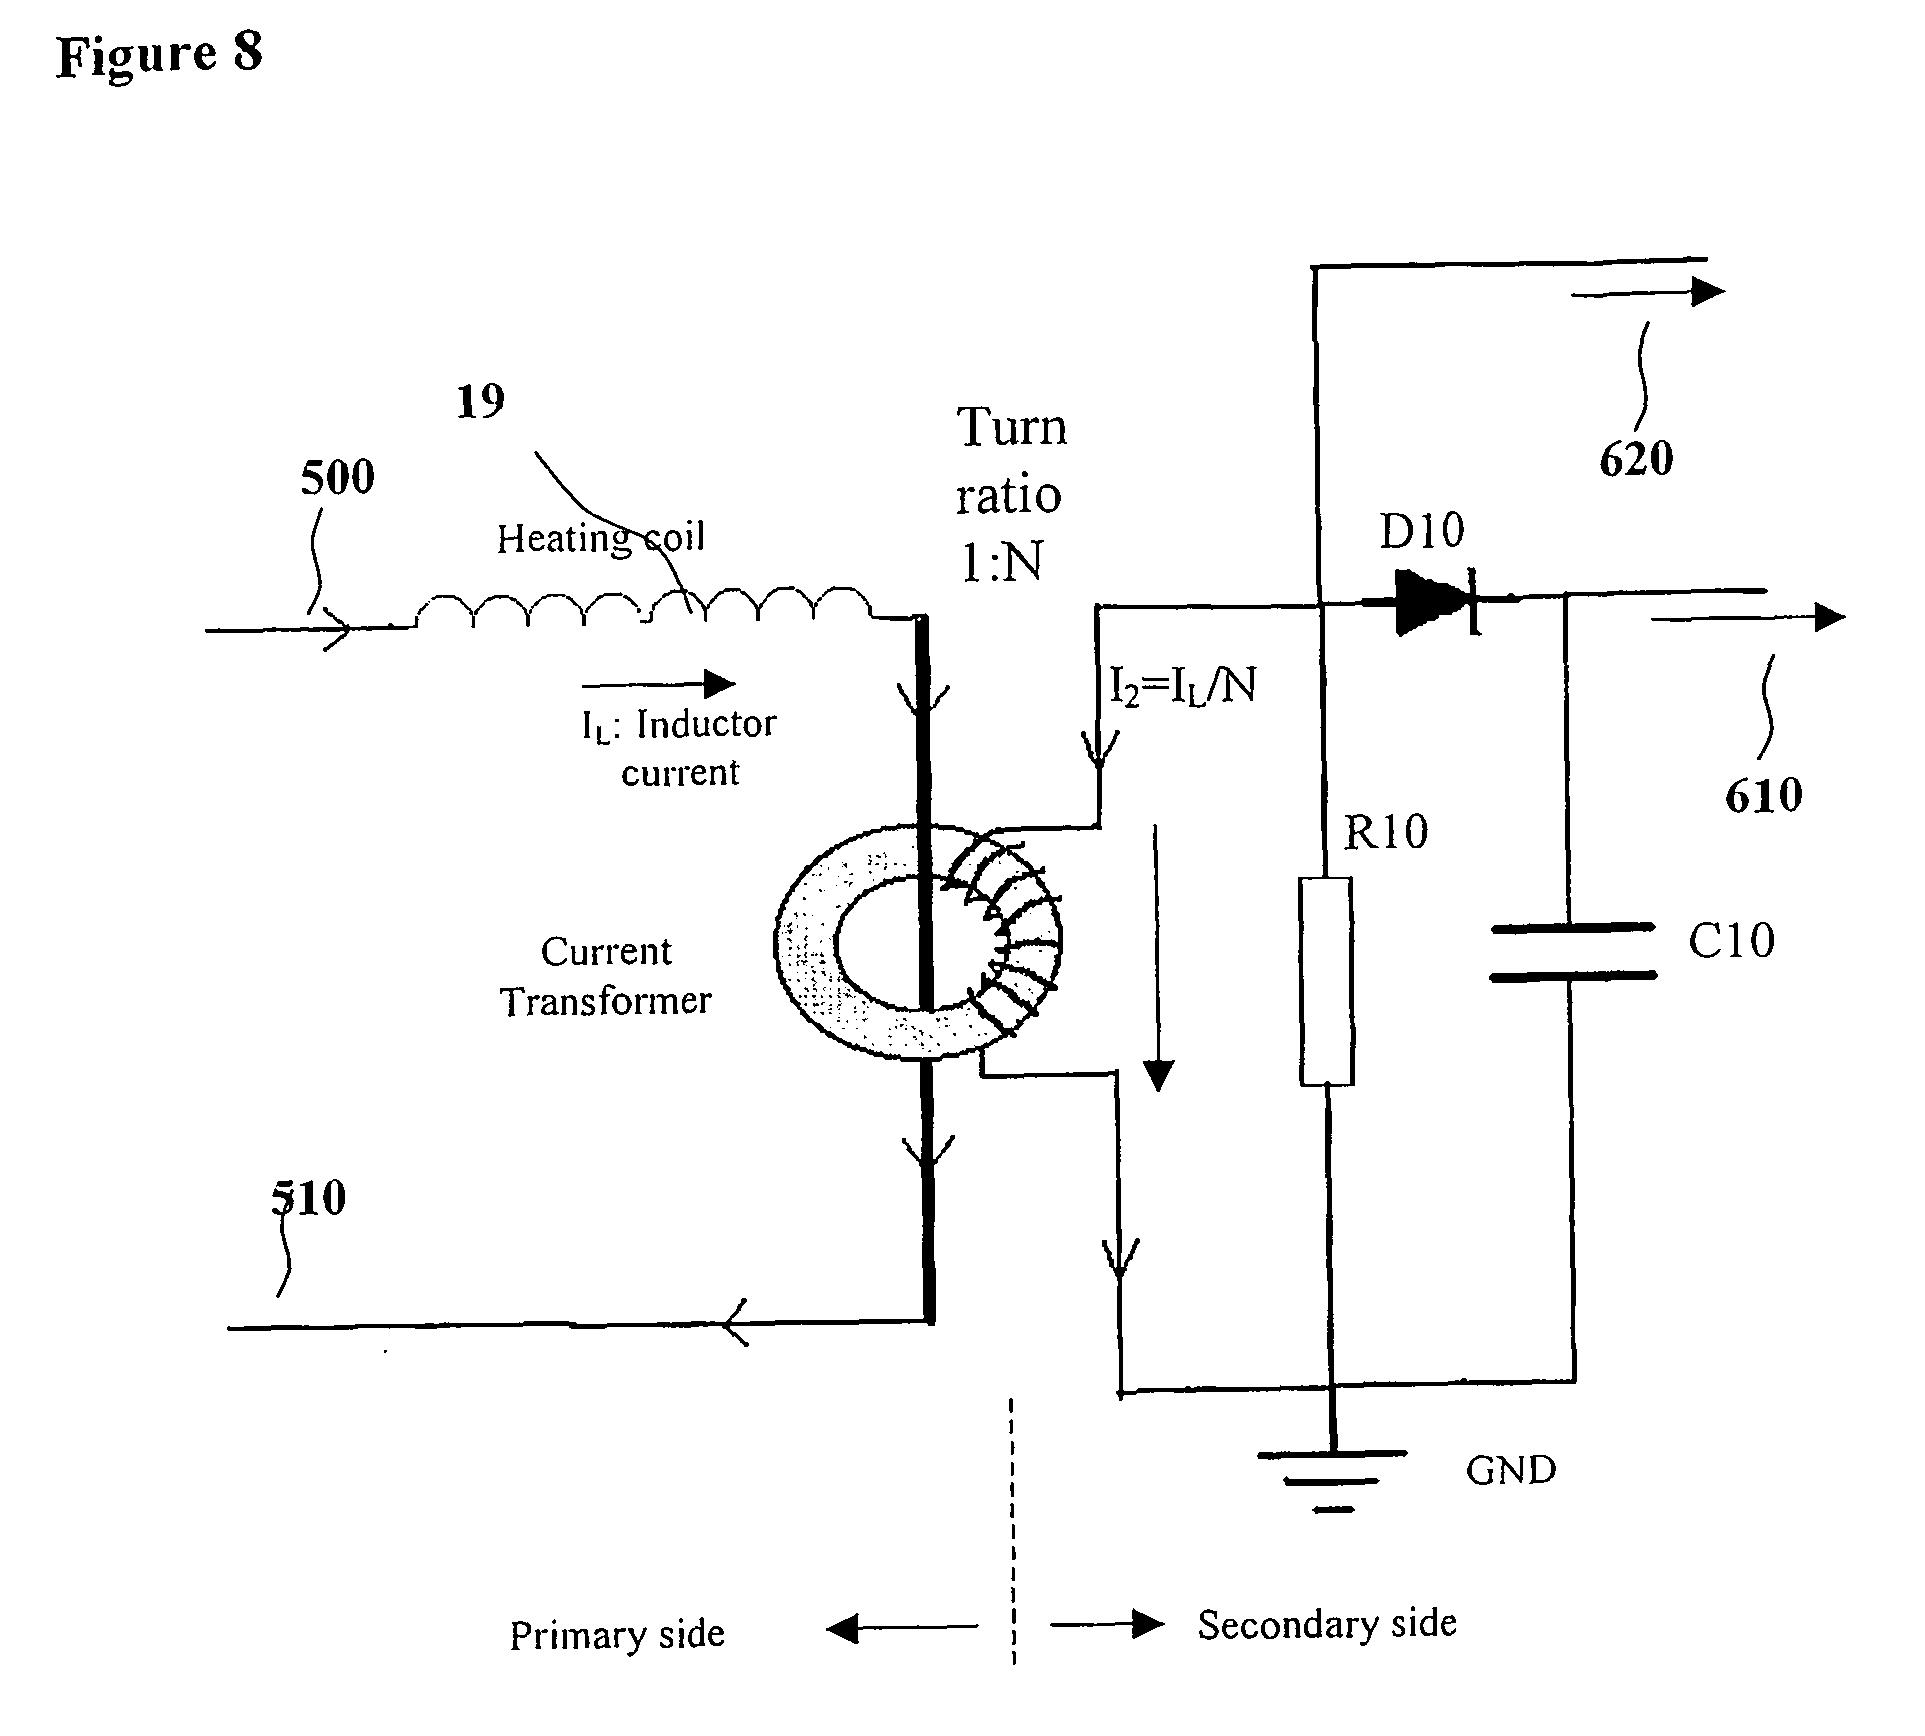 CGFuYXNvbmljLW1pY3Jvd2F2ZS1vdmVuLXNjaGVtYXRpYy1kaWFncmFt likewise KatieKat2004F moreover Index further Mag ic Circuits as well US7385528. on panasonic schematic diagram circuit